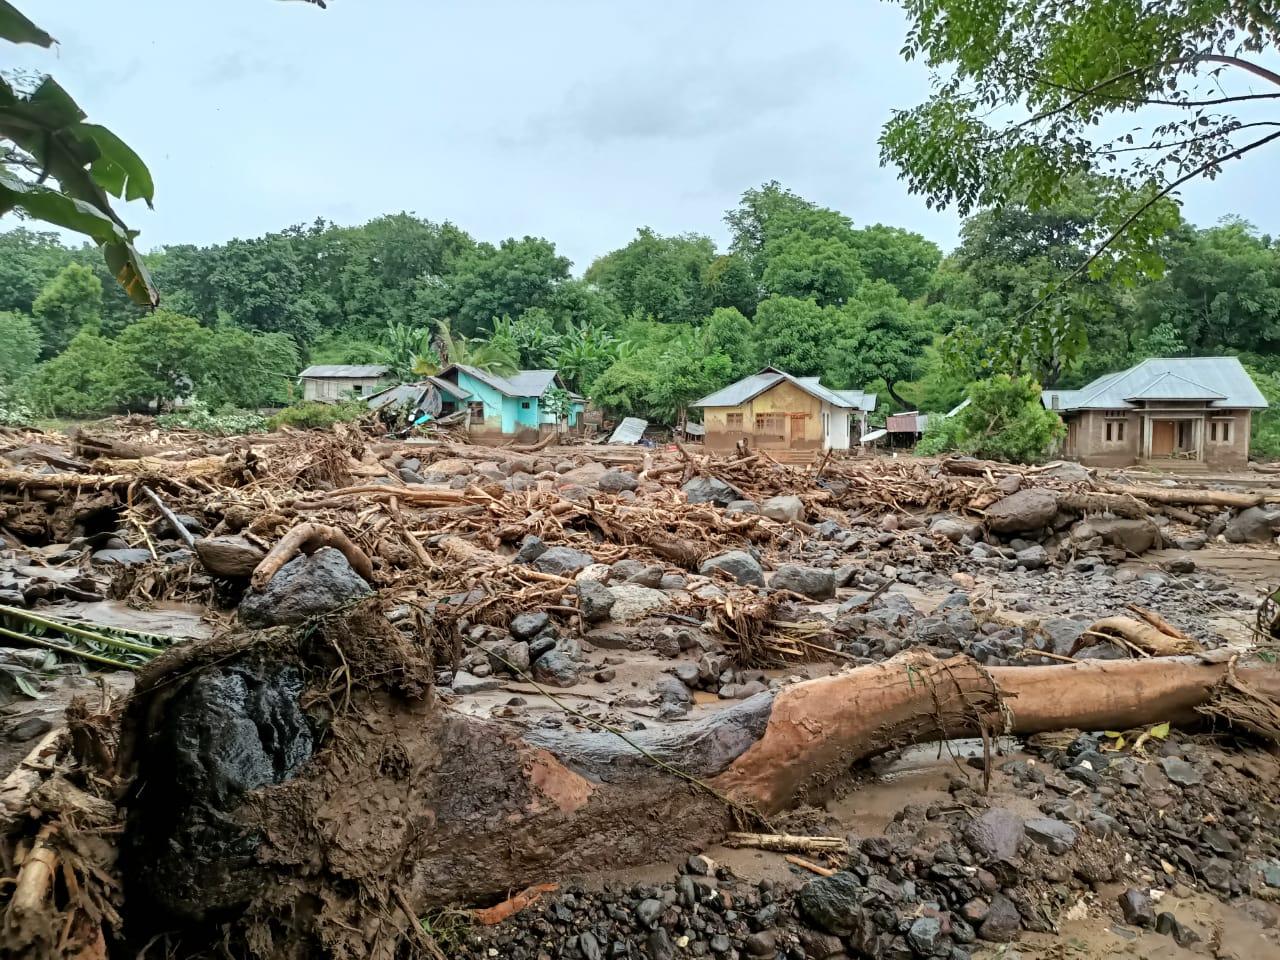 Korban Meninggal Tanah Longsor dan Banjir di Lembata Jadi 16 Orang